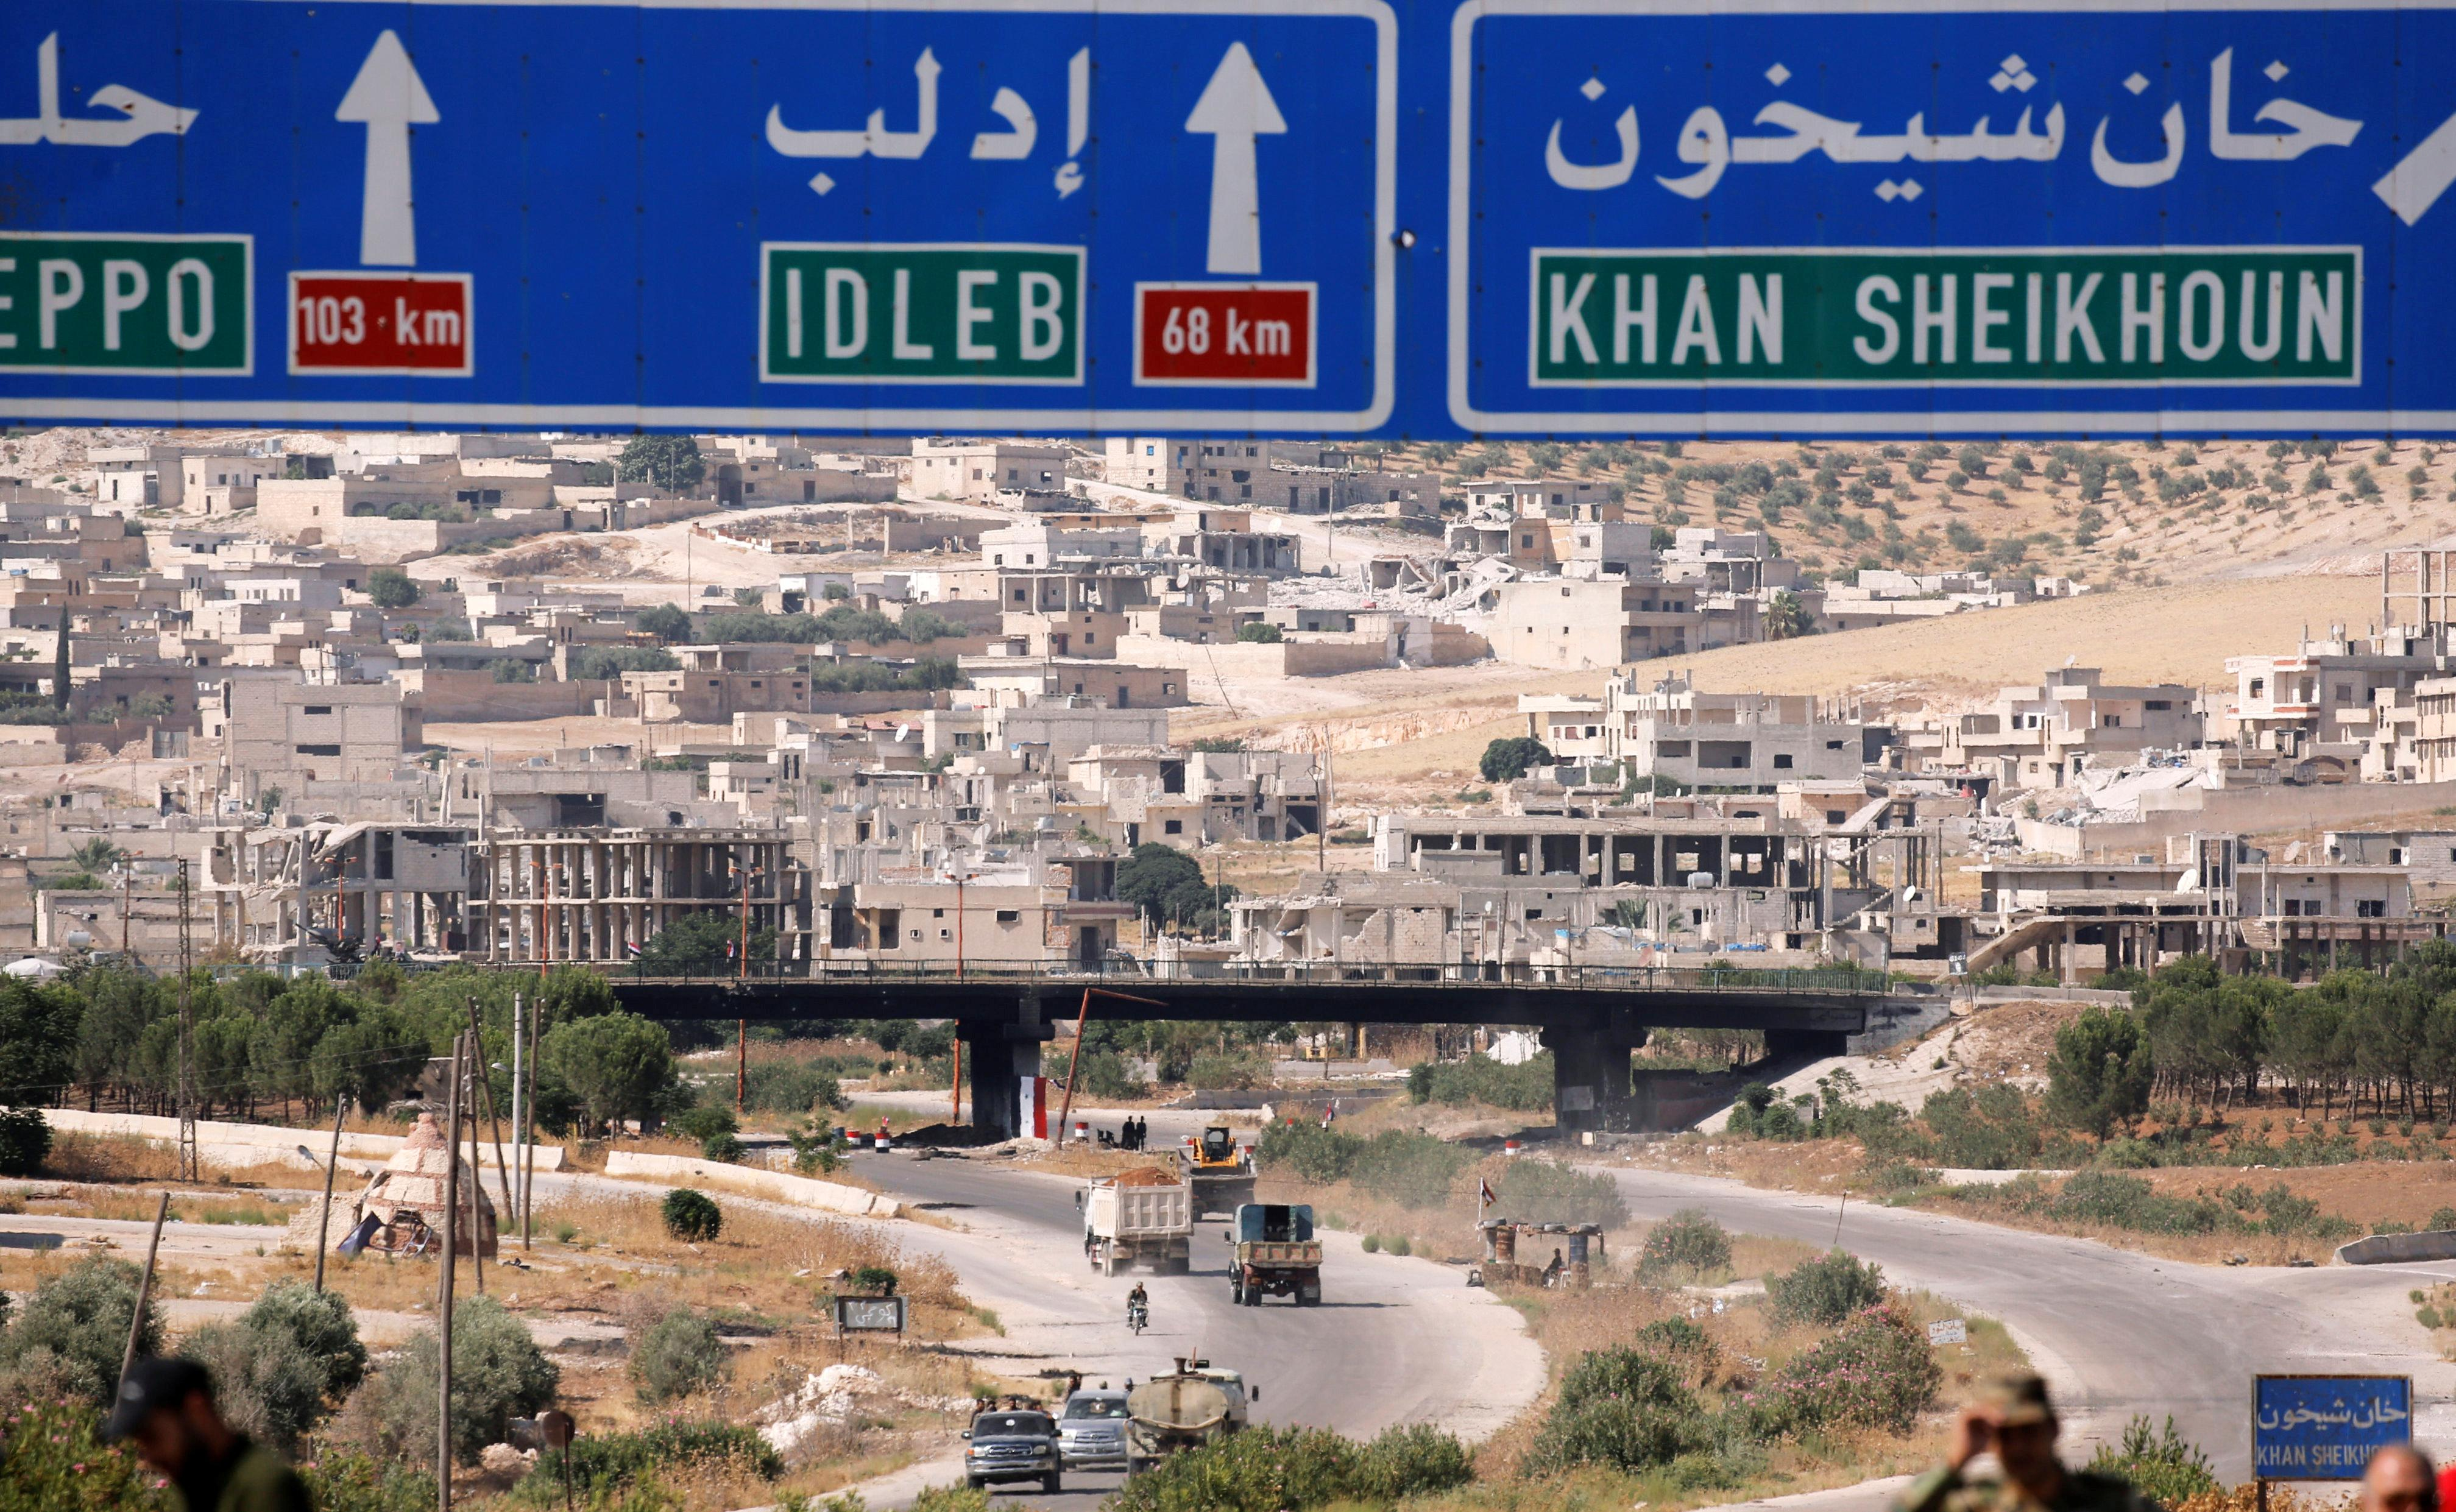 Russia, Iran and Turkey to discuss Syria's Idlib at Monday summit: Kremlin